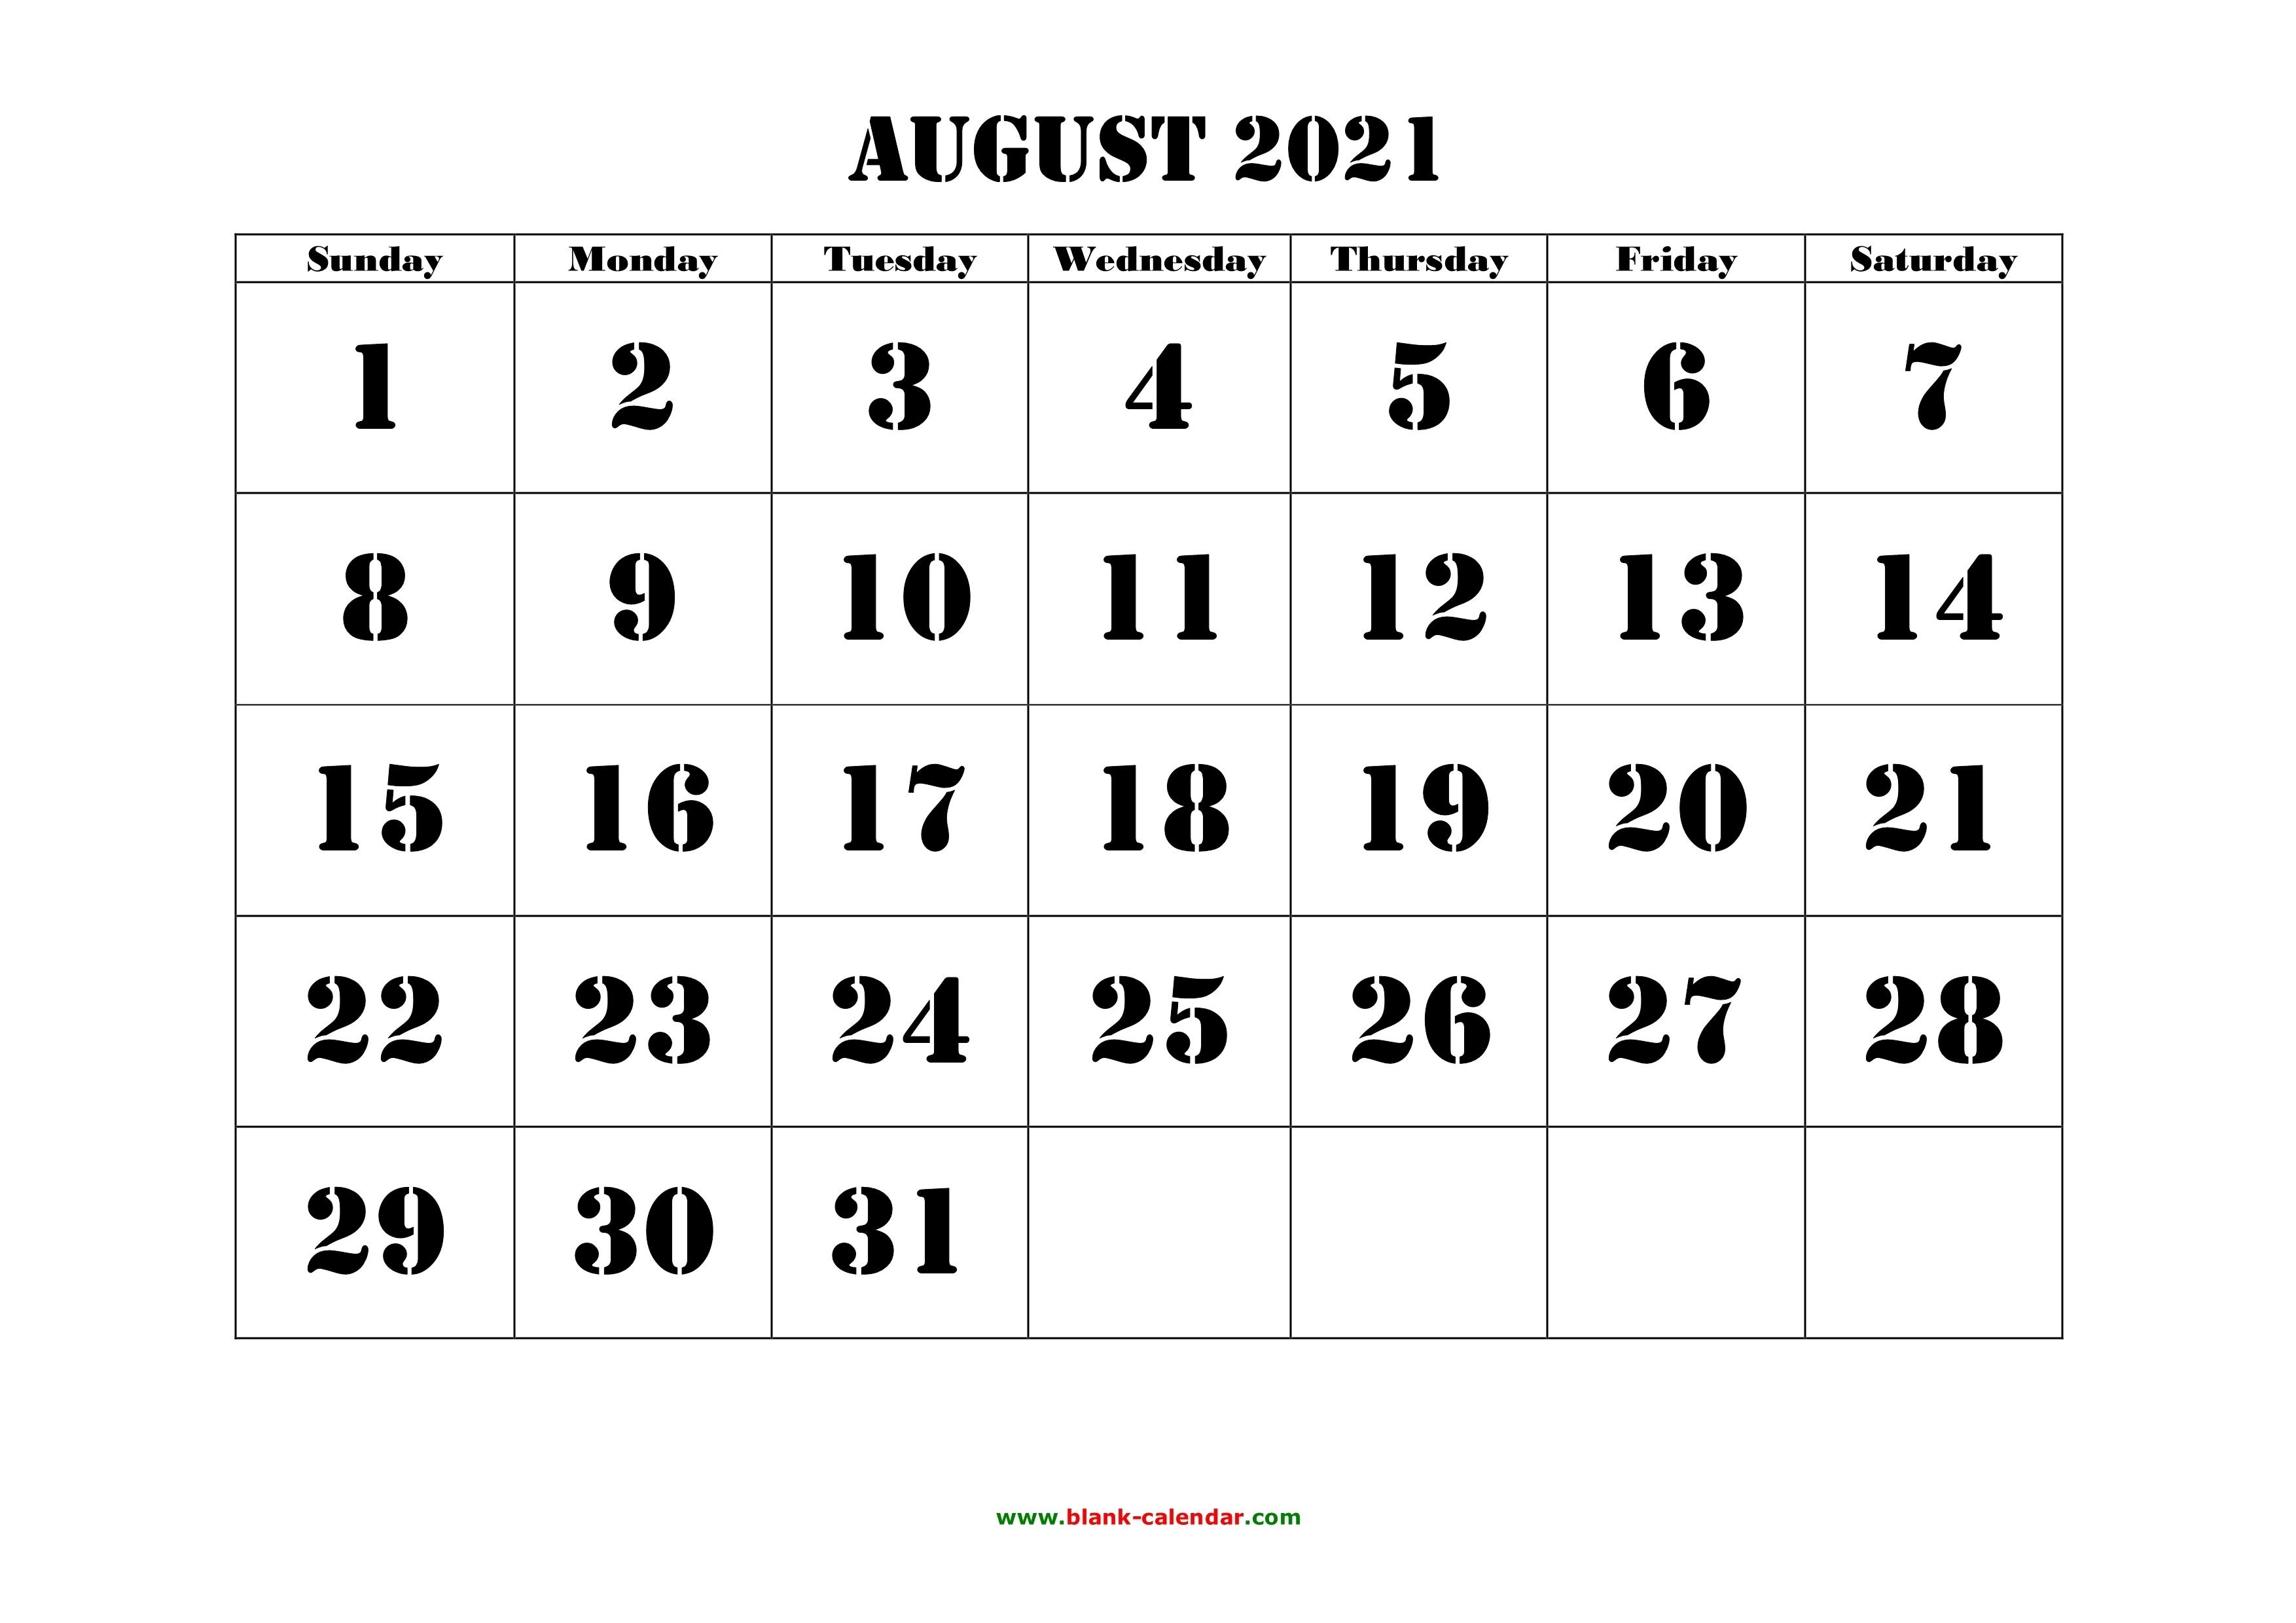 Free Download Printable August 2021 Calendar, Large Font August 2021 Calendar Print